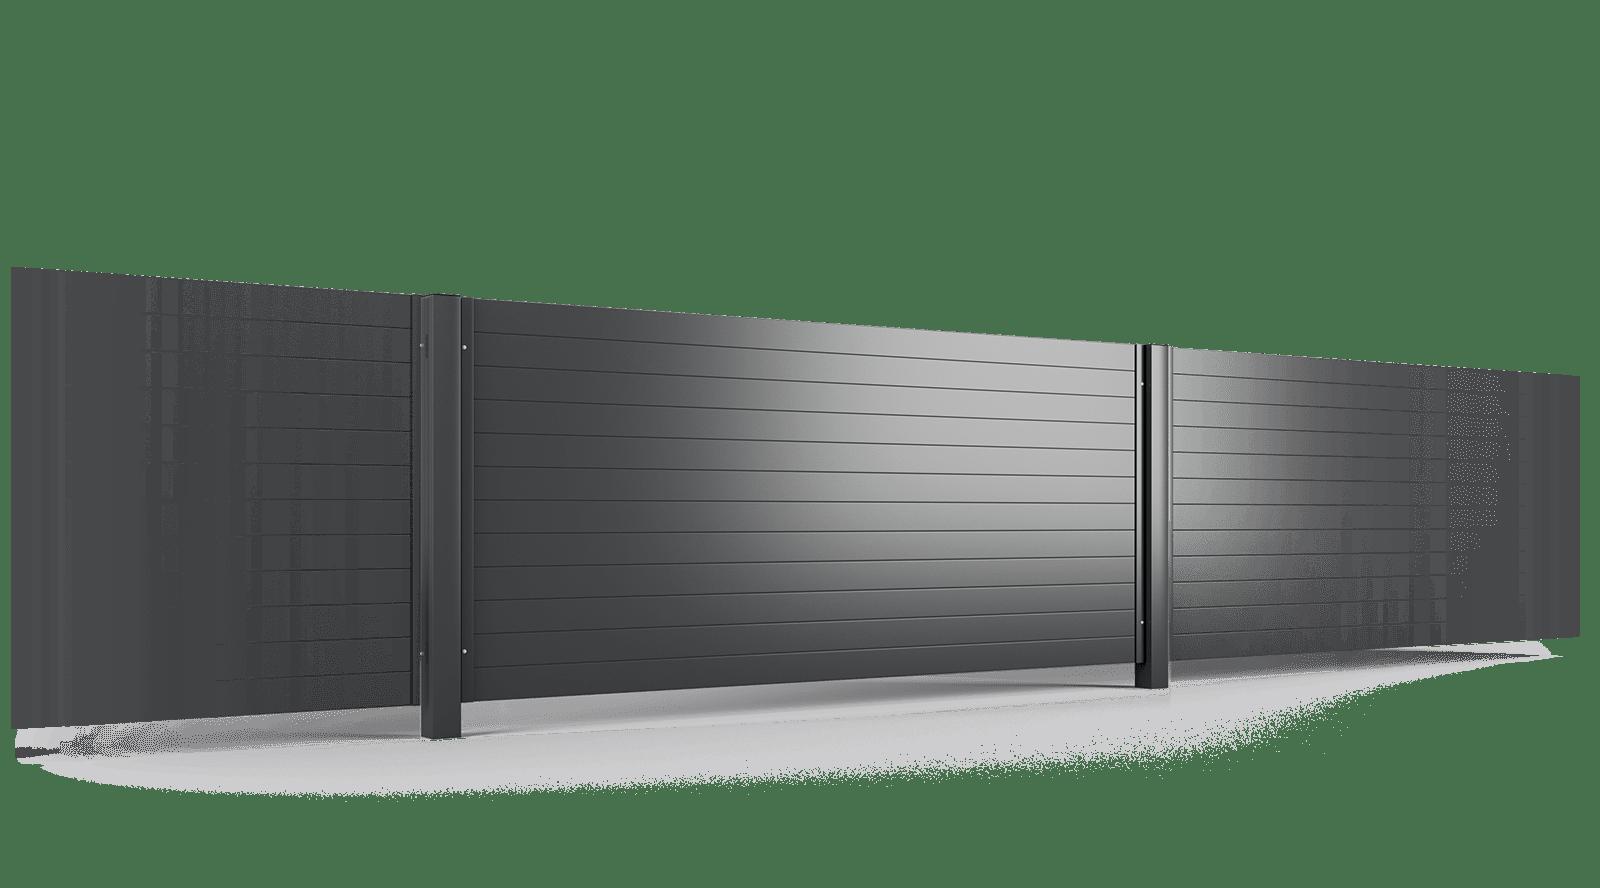 Ogrodzenie palisadowe PP002 (P102) KONSPORT BORDER